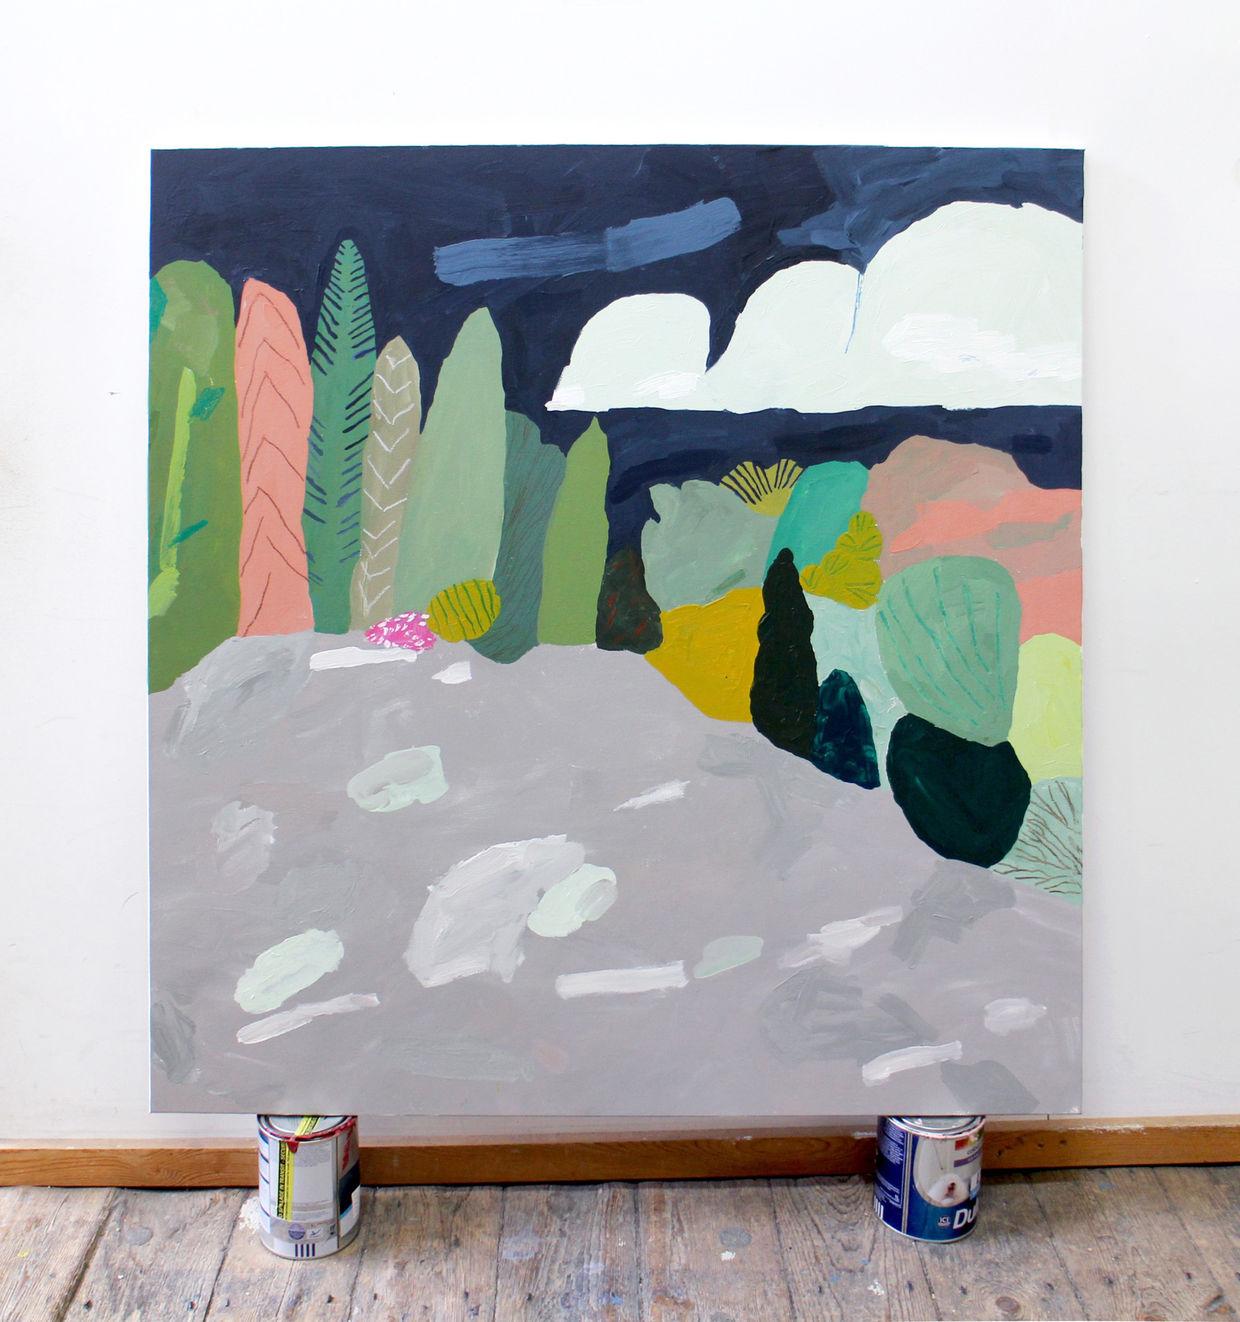 Charlotte Mei c/o JSR AGENCY : Painter, Ceramics + Portraiture